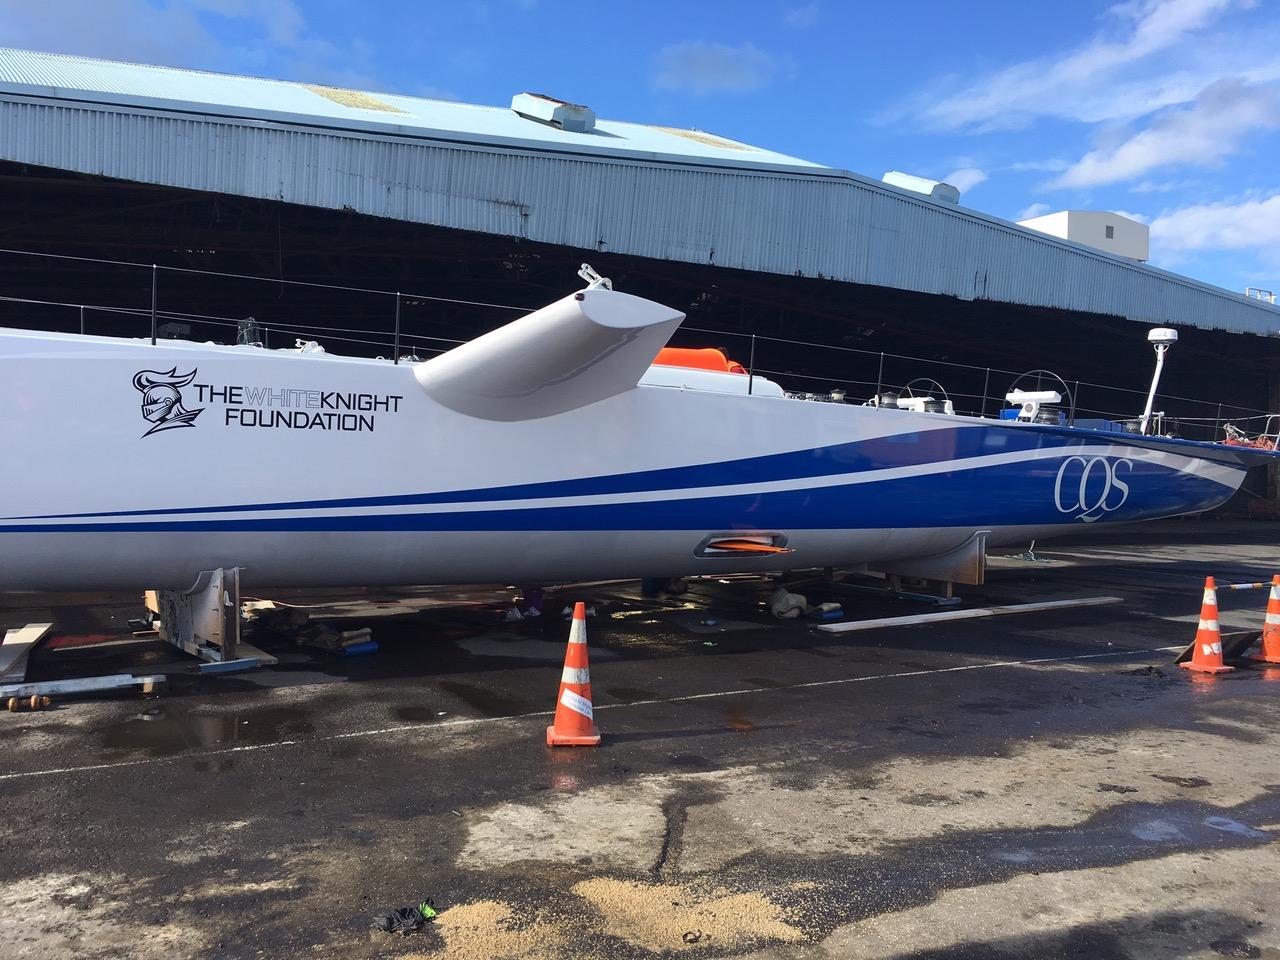 CQS in situ at Tauranga. Wings protruding.